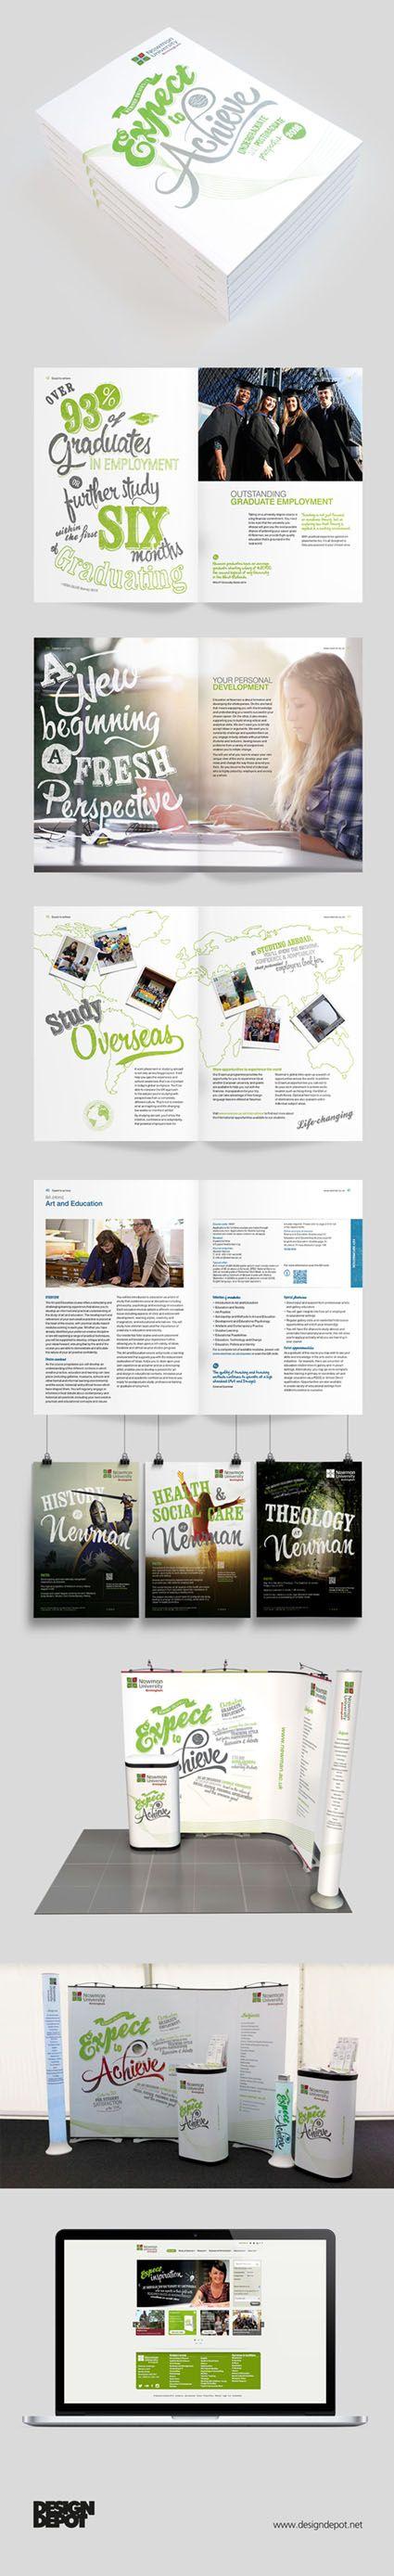 College Brochure Designs